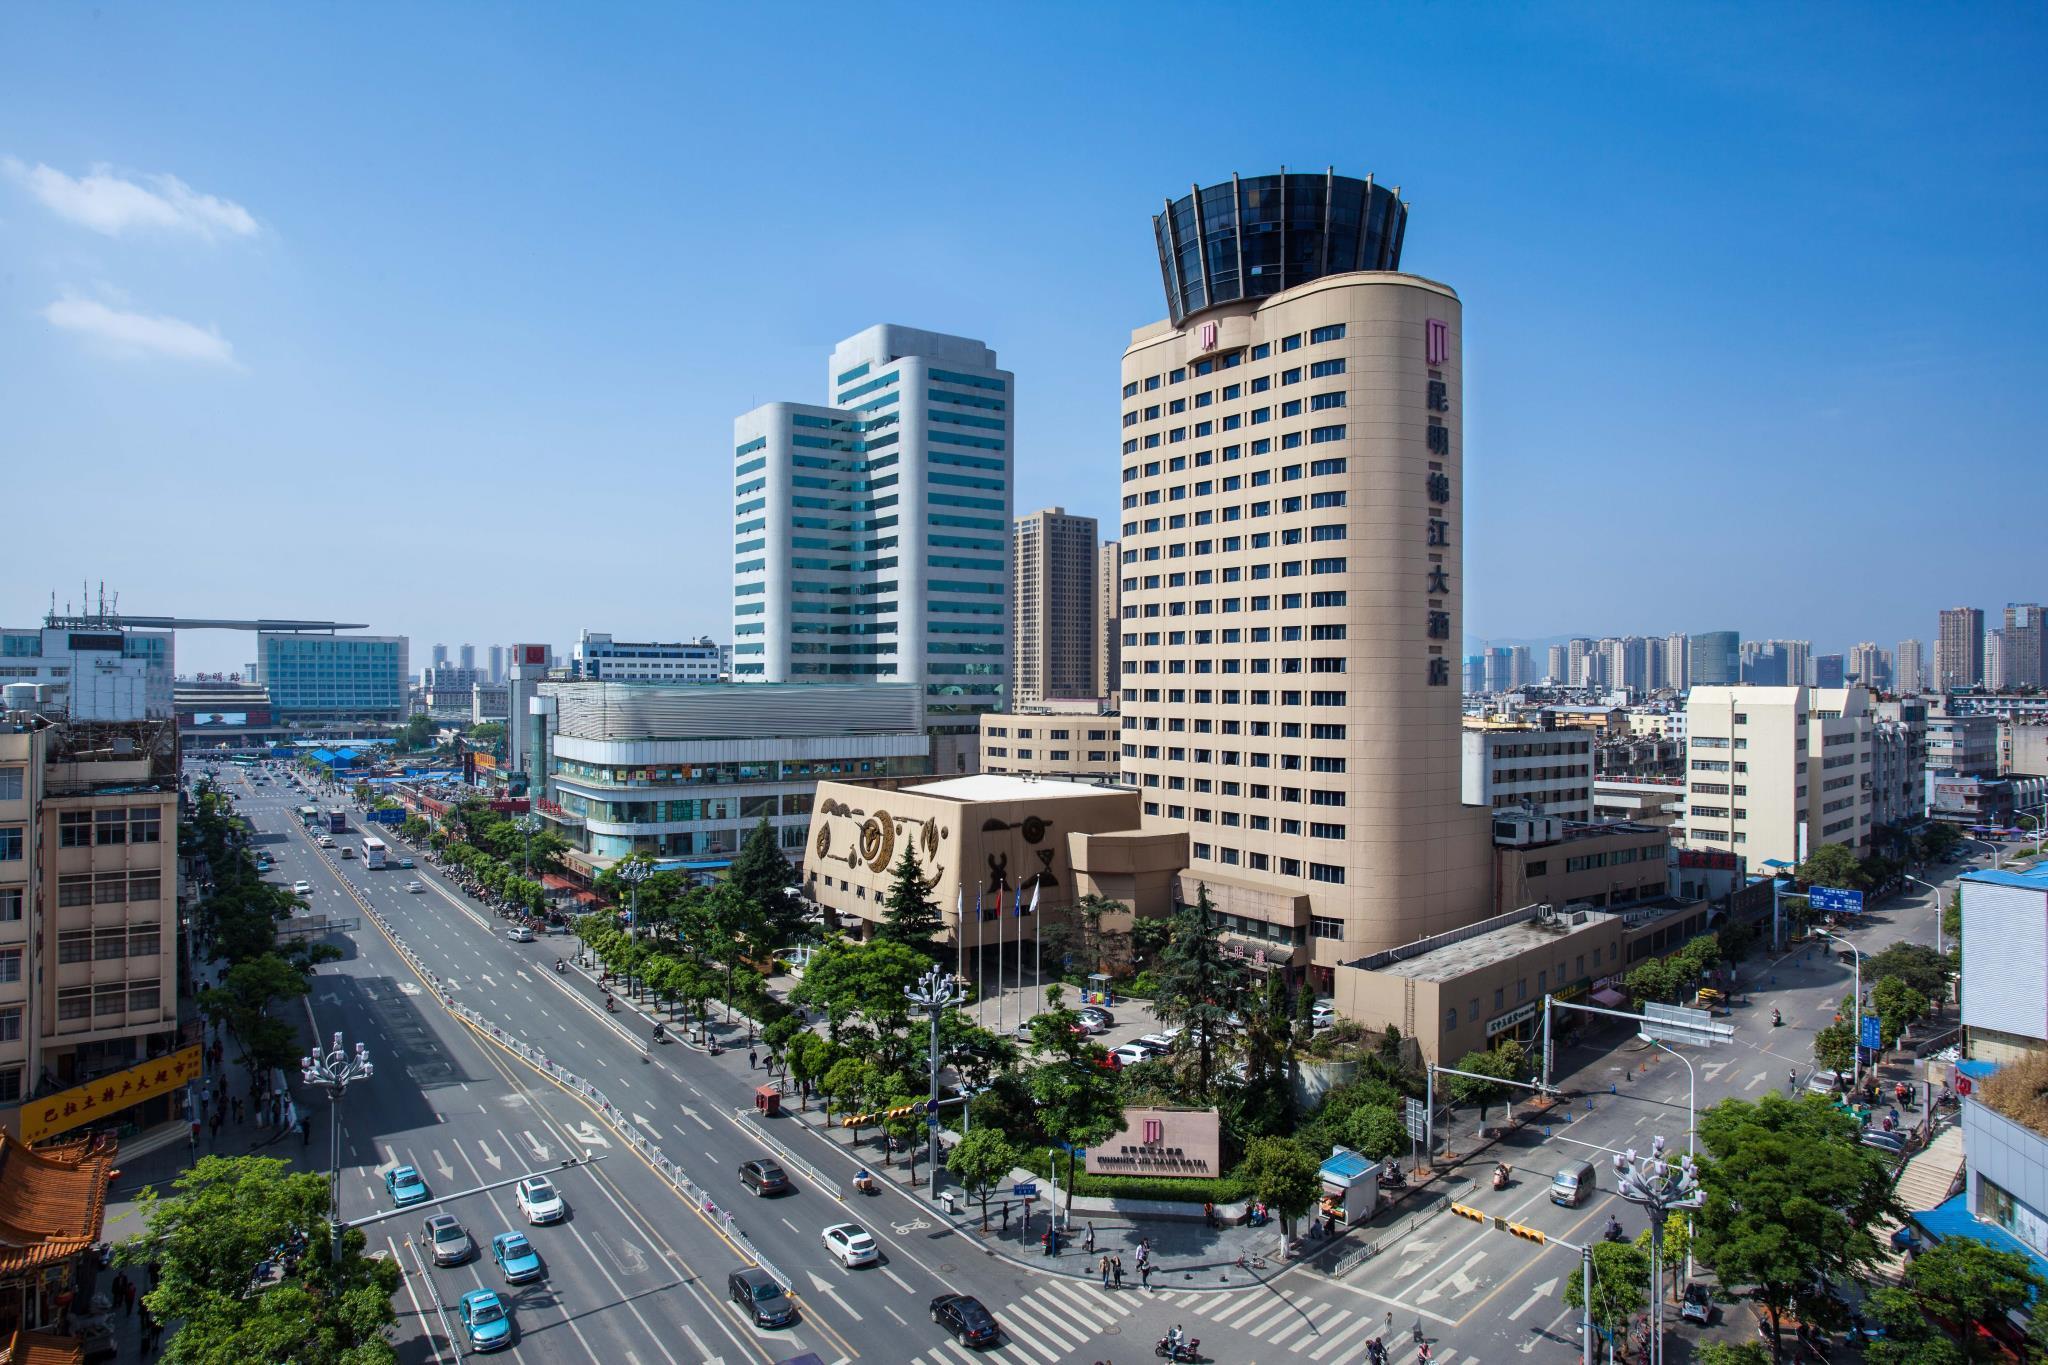 10 best kunming hotels hd photos reviews of hotels in kunming china rh agoda com